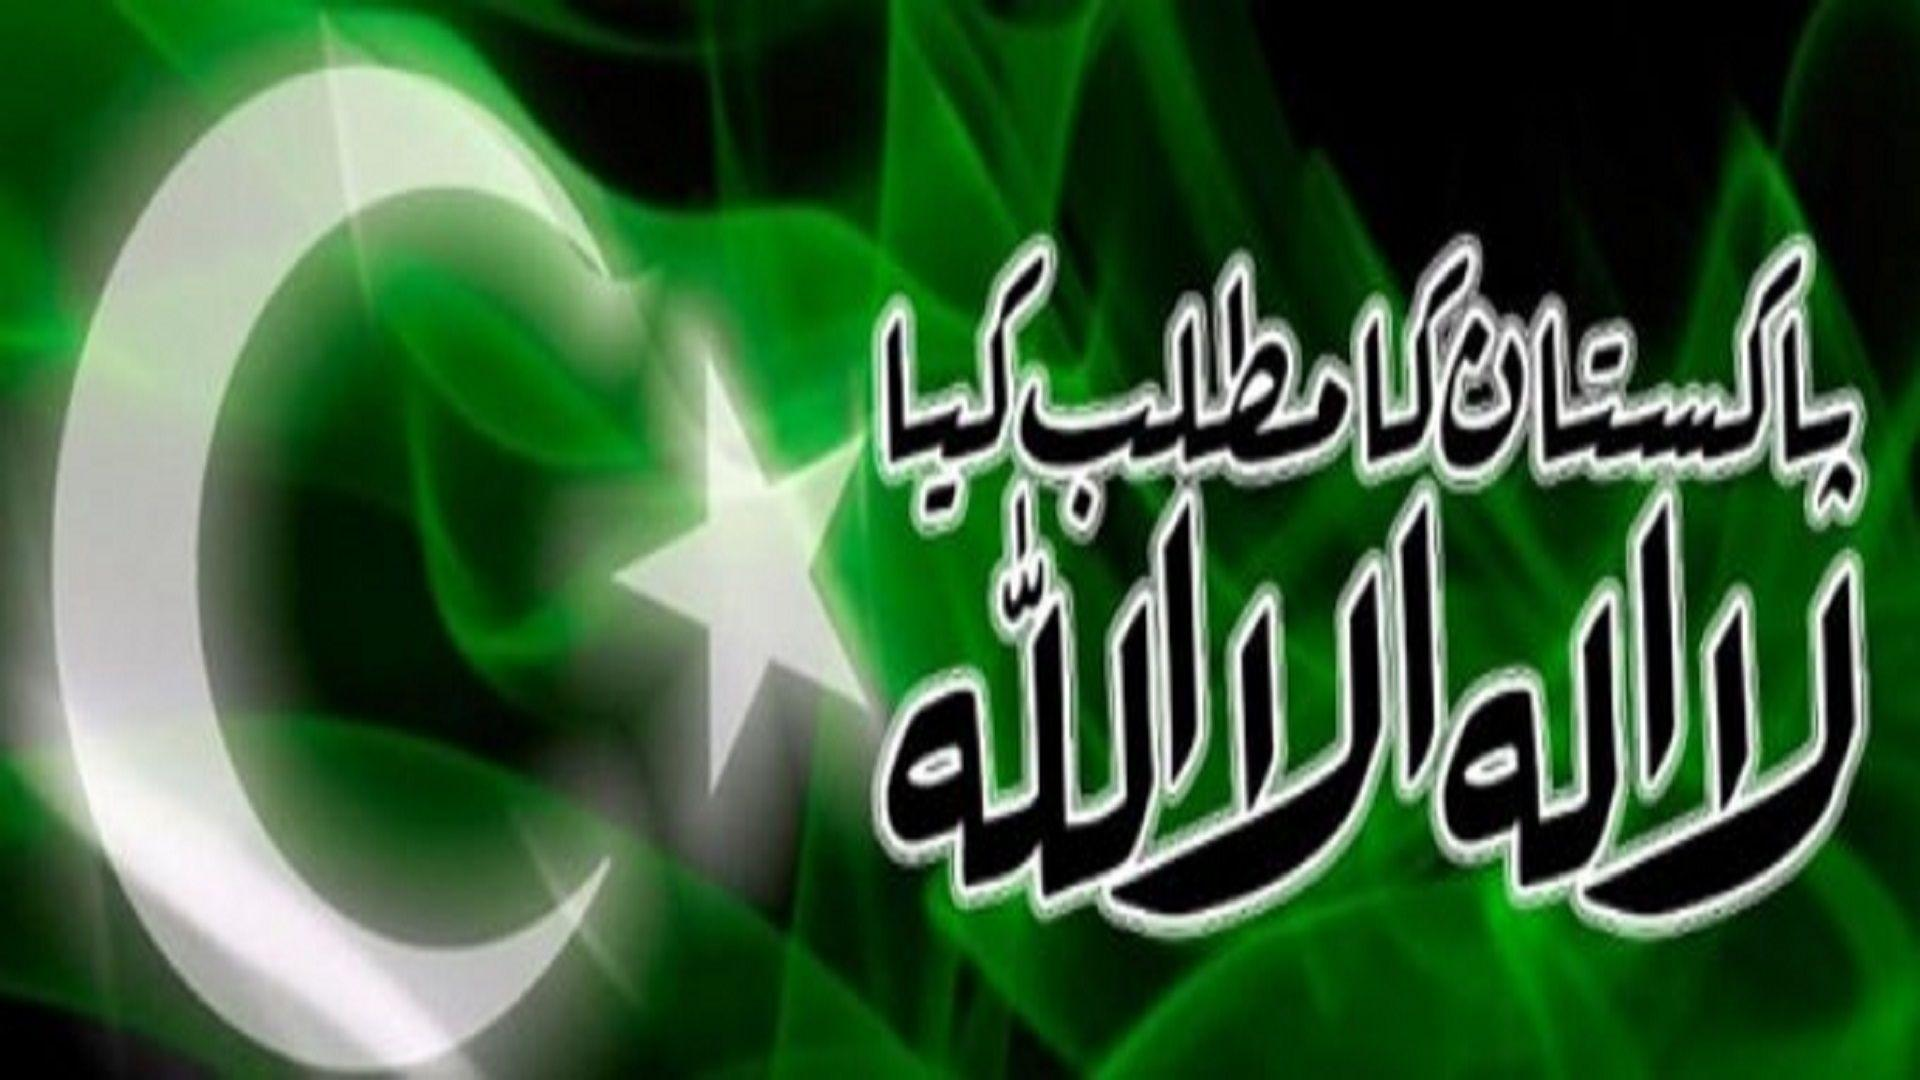 pakistan flag hd wallpapers - photo #31